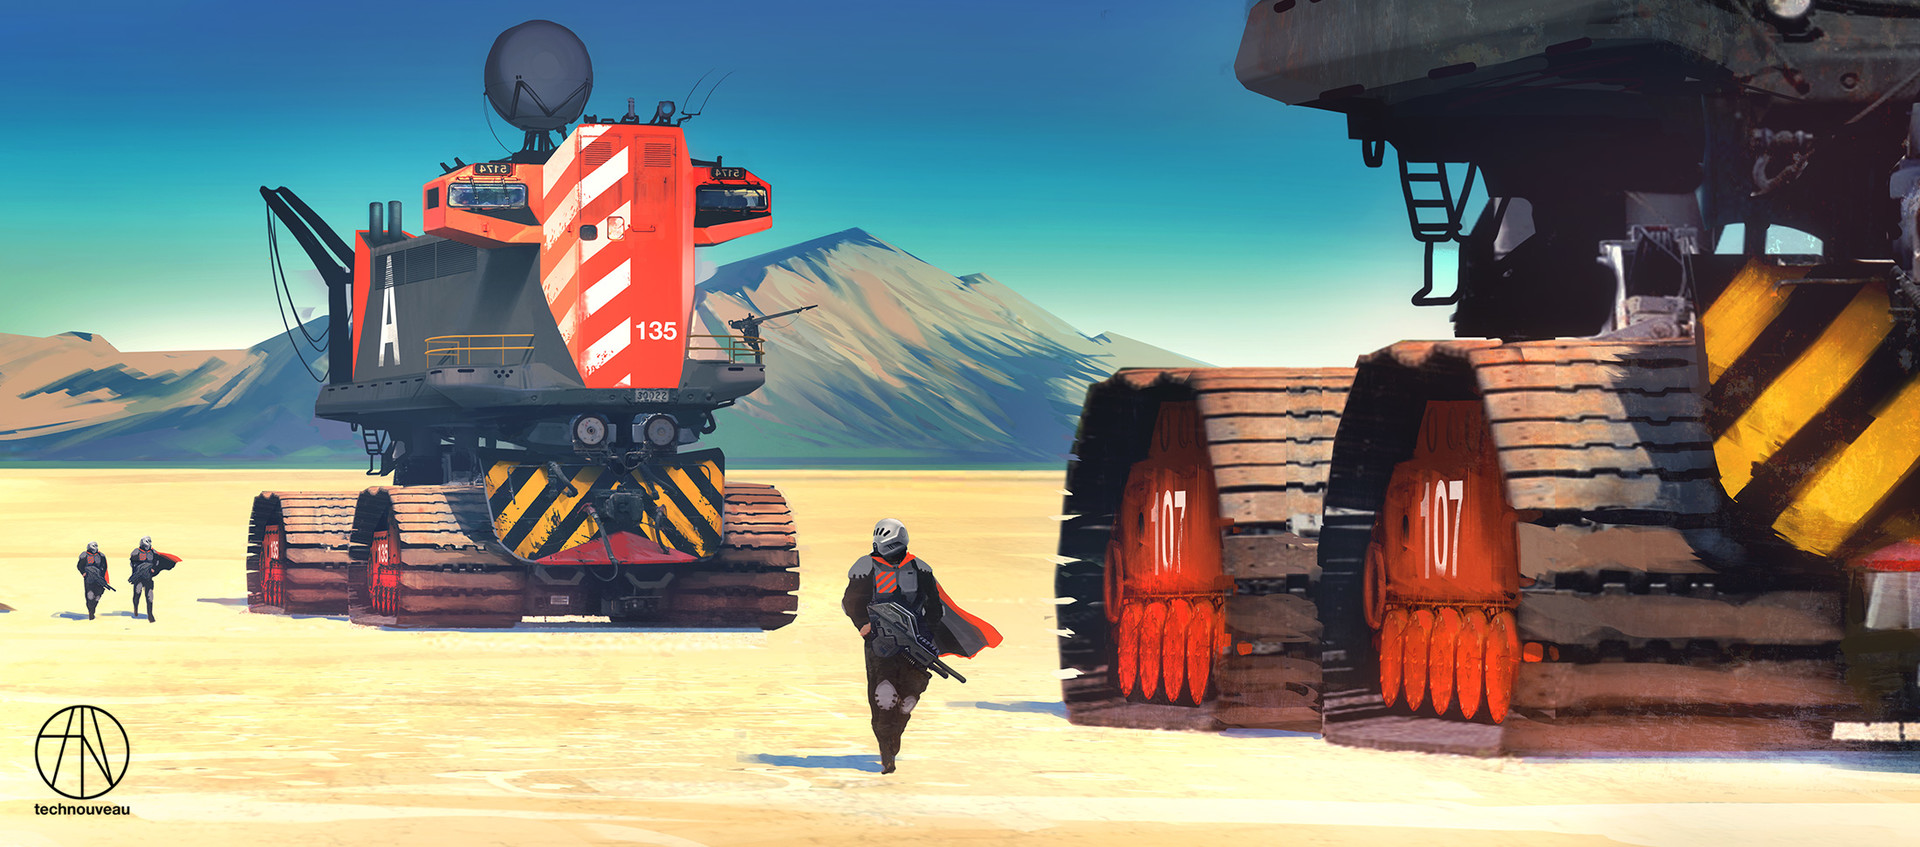 Rasmus poulsen crawlers desert